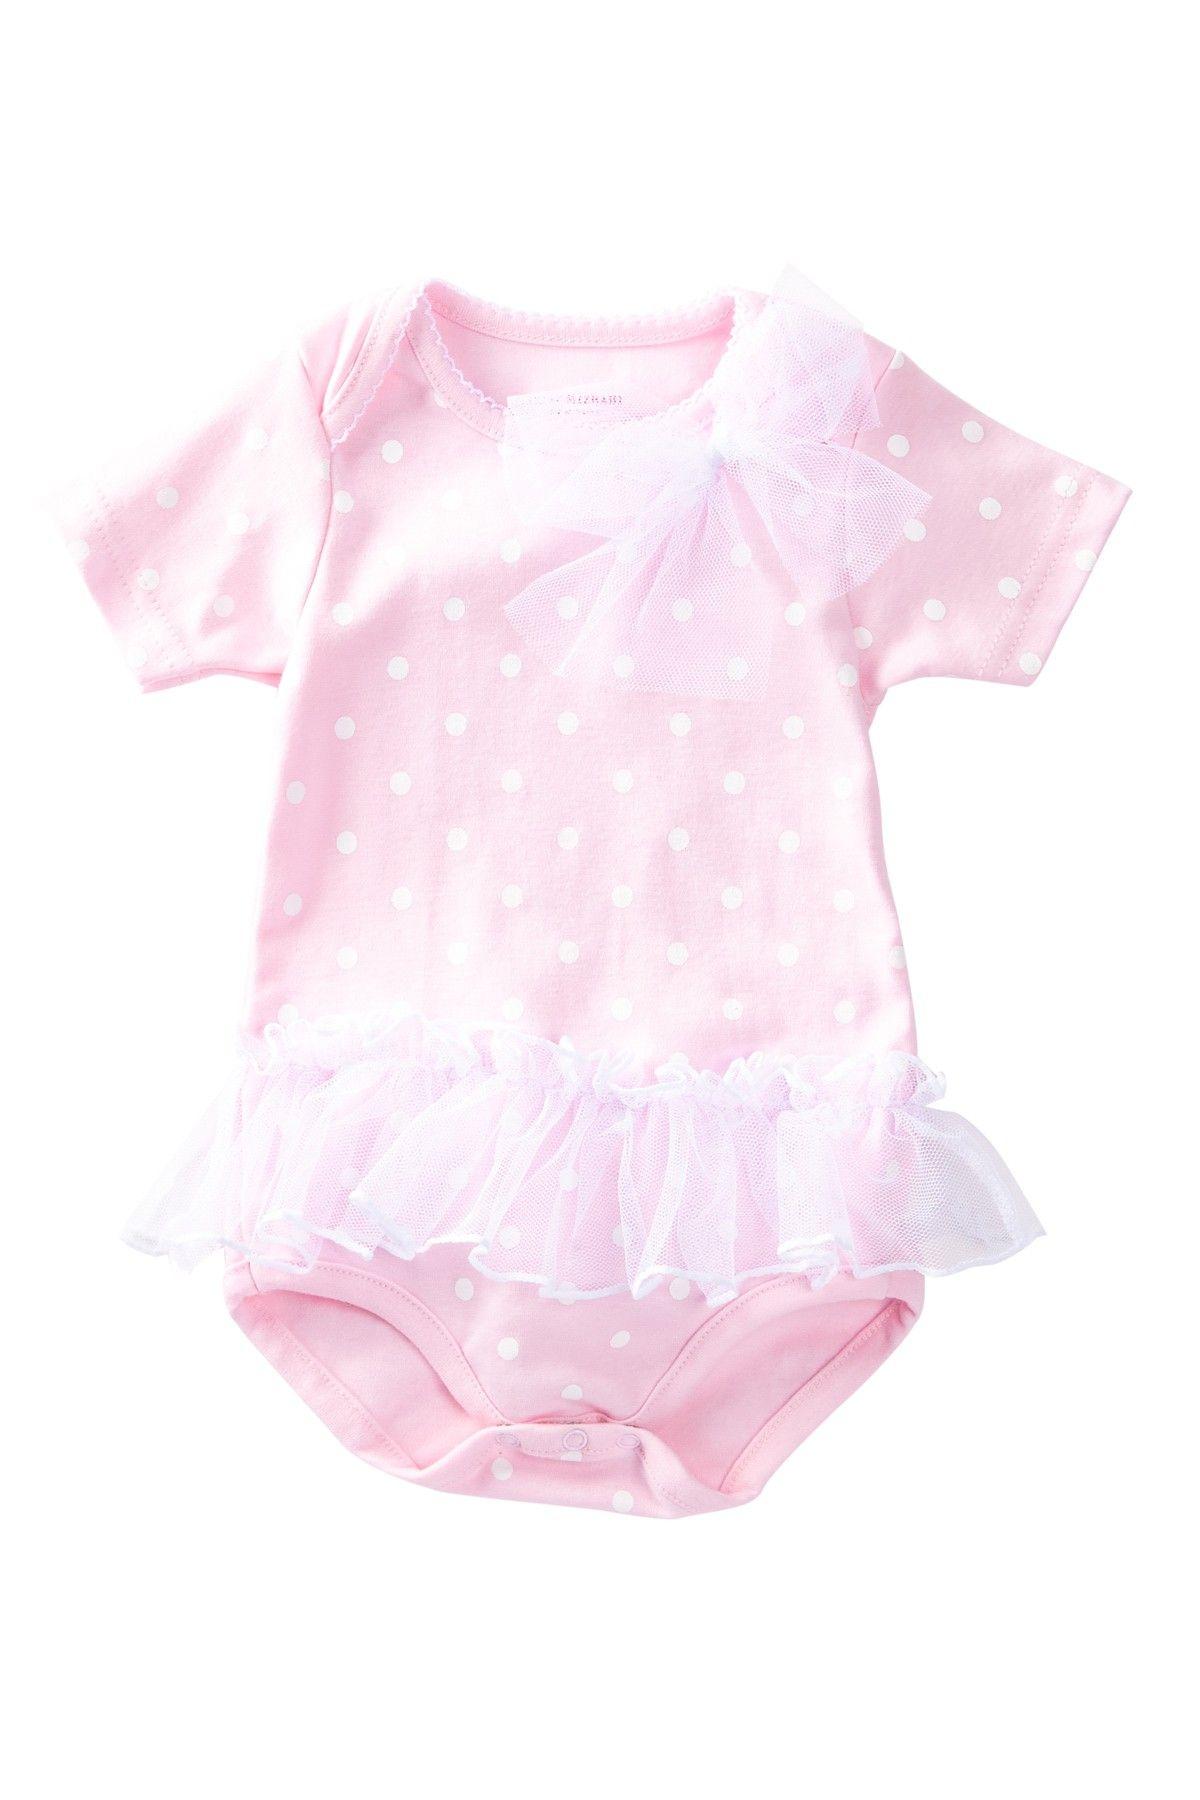 Isaac Mizrahi Polka Dot Skirted Bodysuit Baby Girls